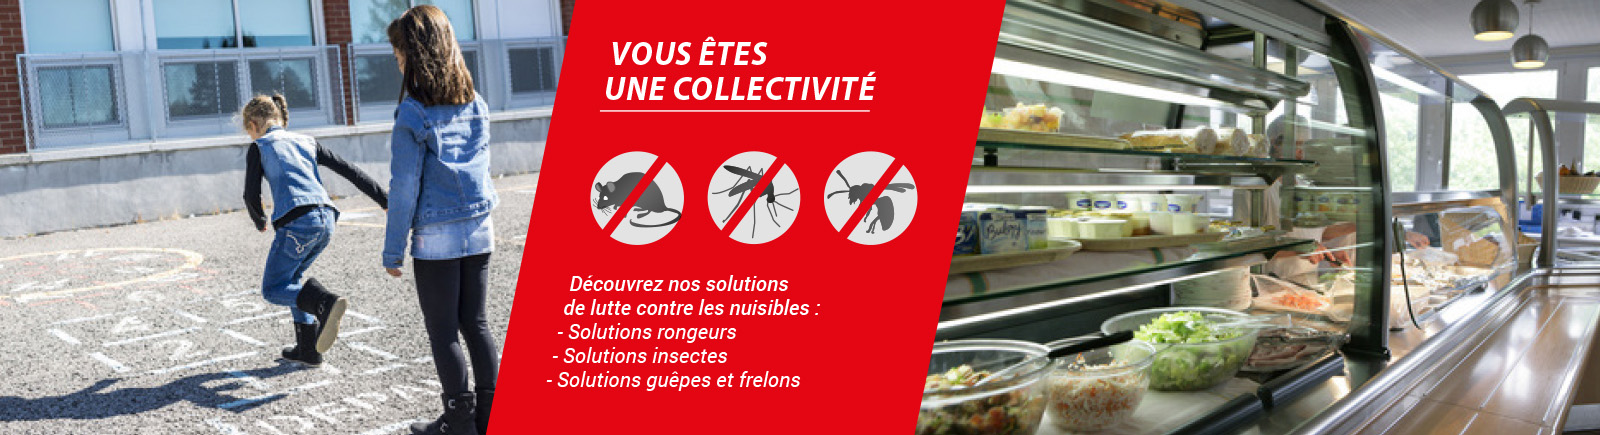 Farago Bourgogne | Collectivité